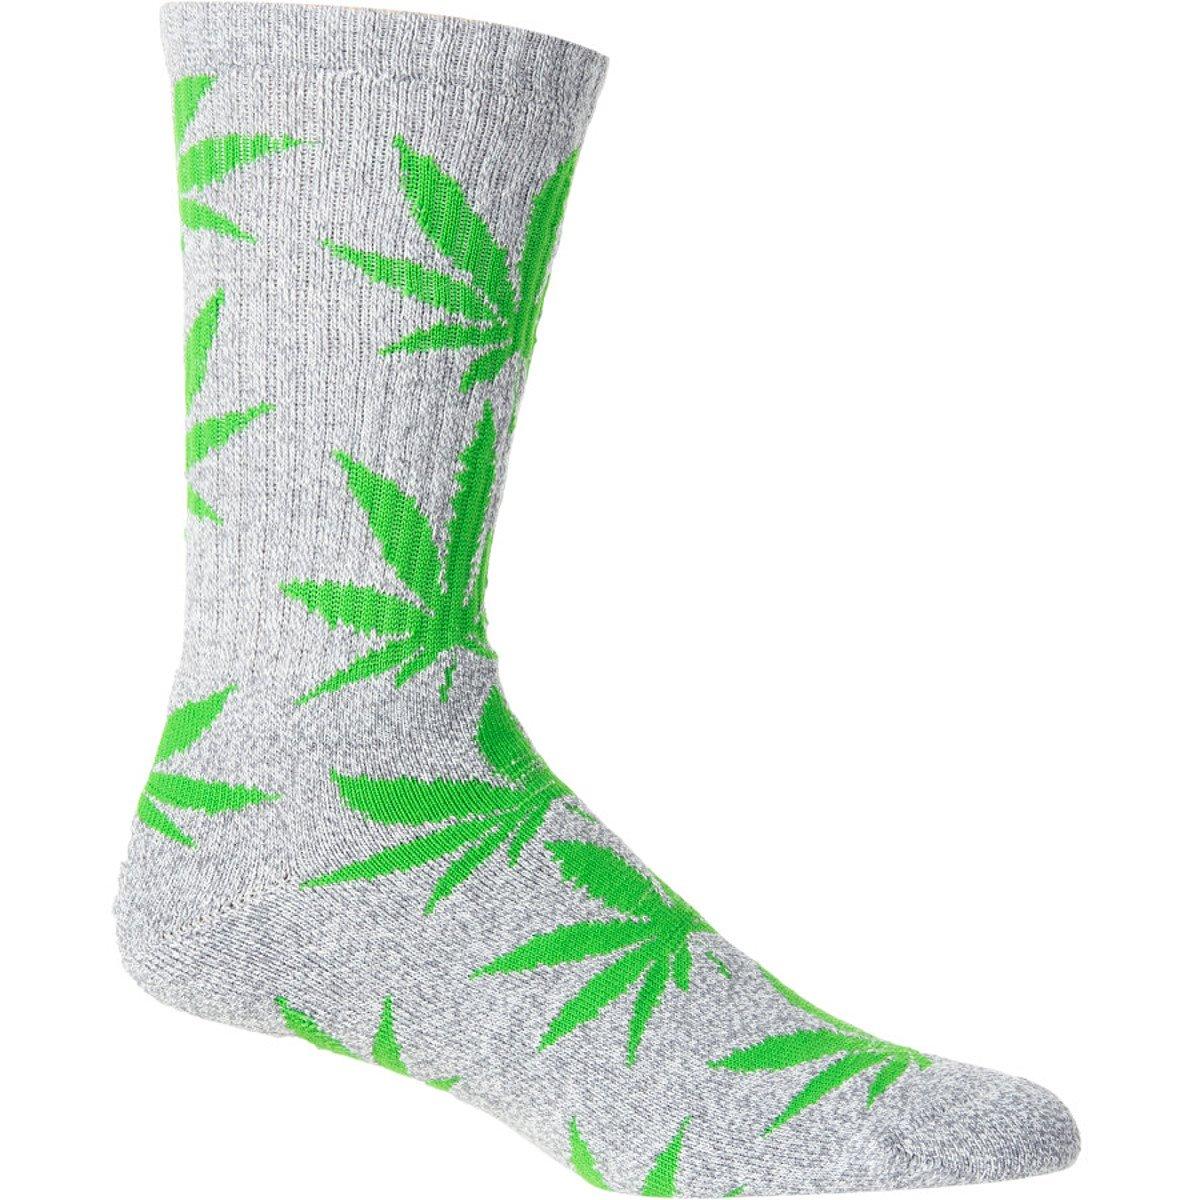 Huf Unisex Plantlife Leaf Weed High Socks Free Next Day Delivery Various Designs